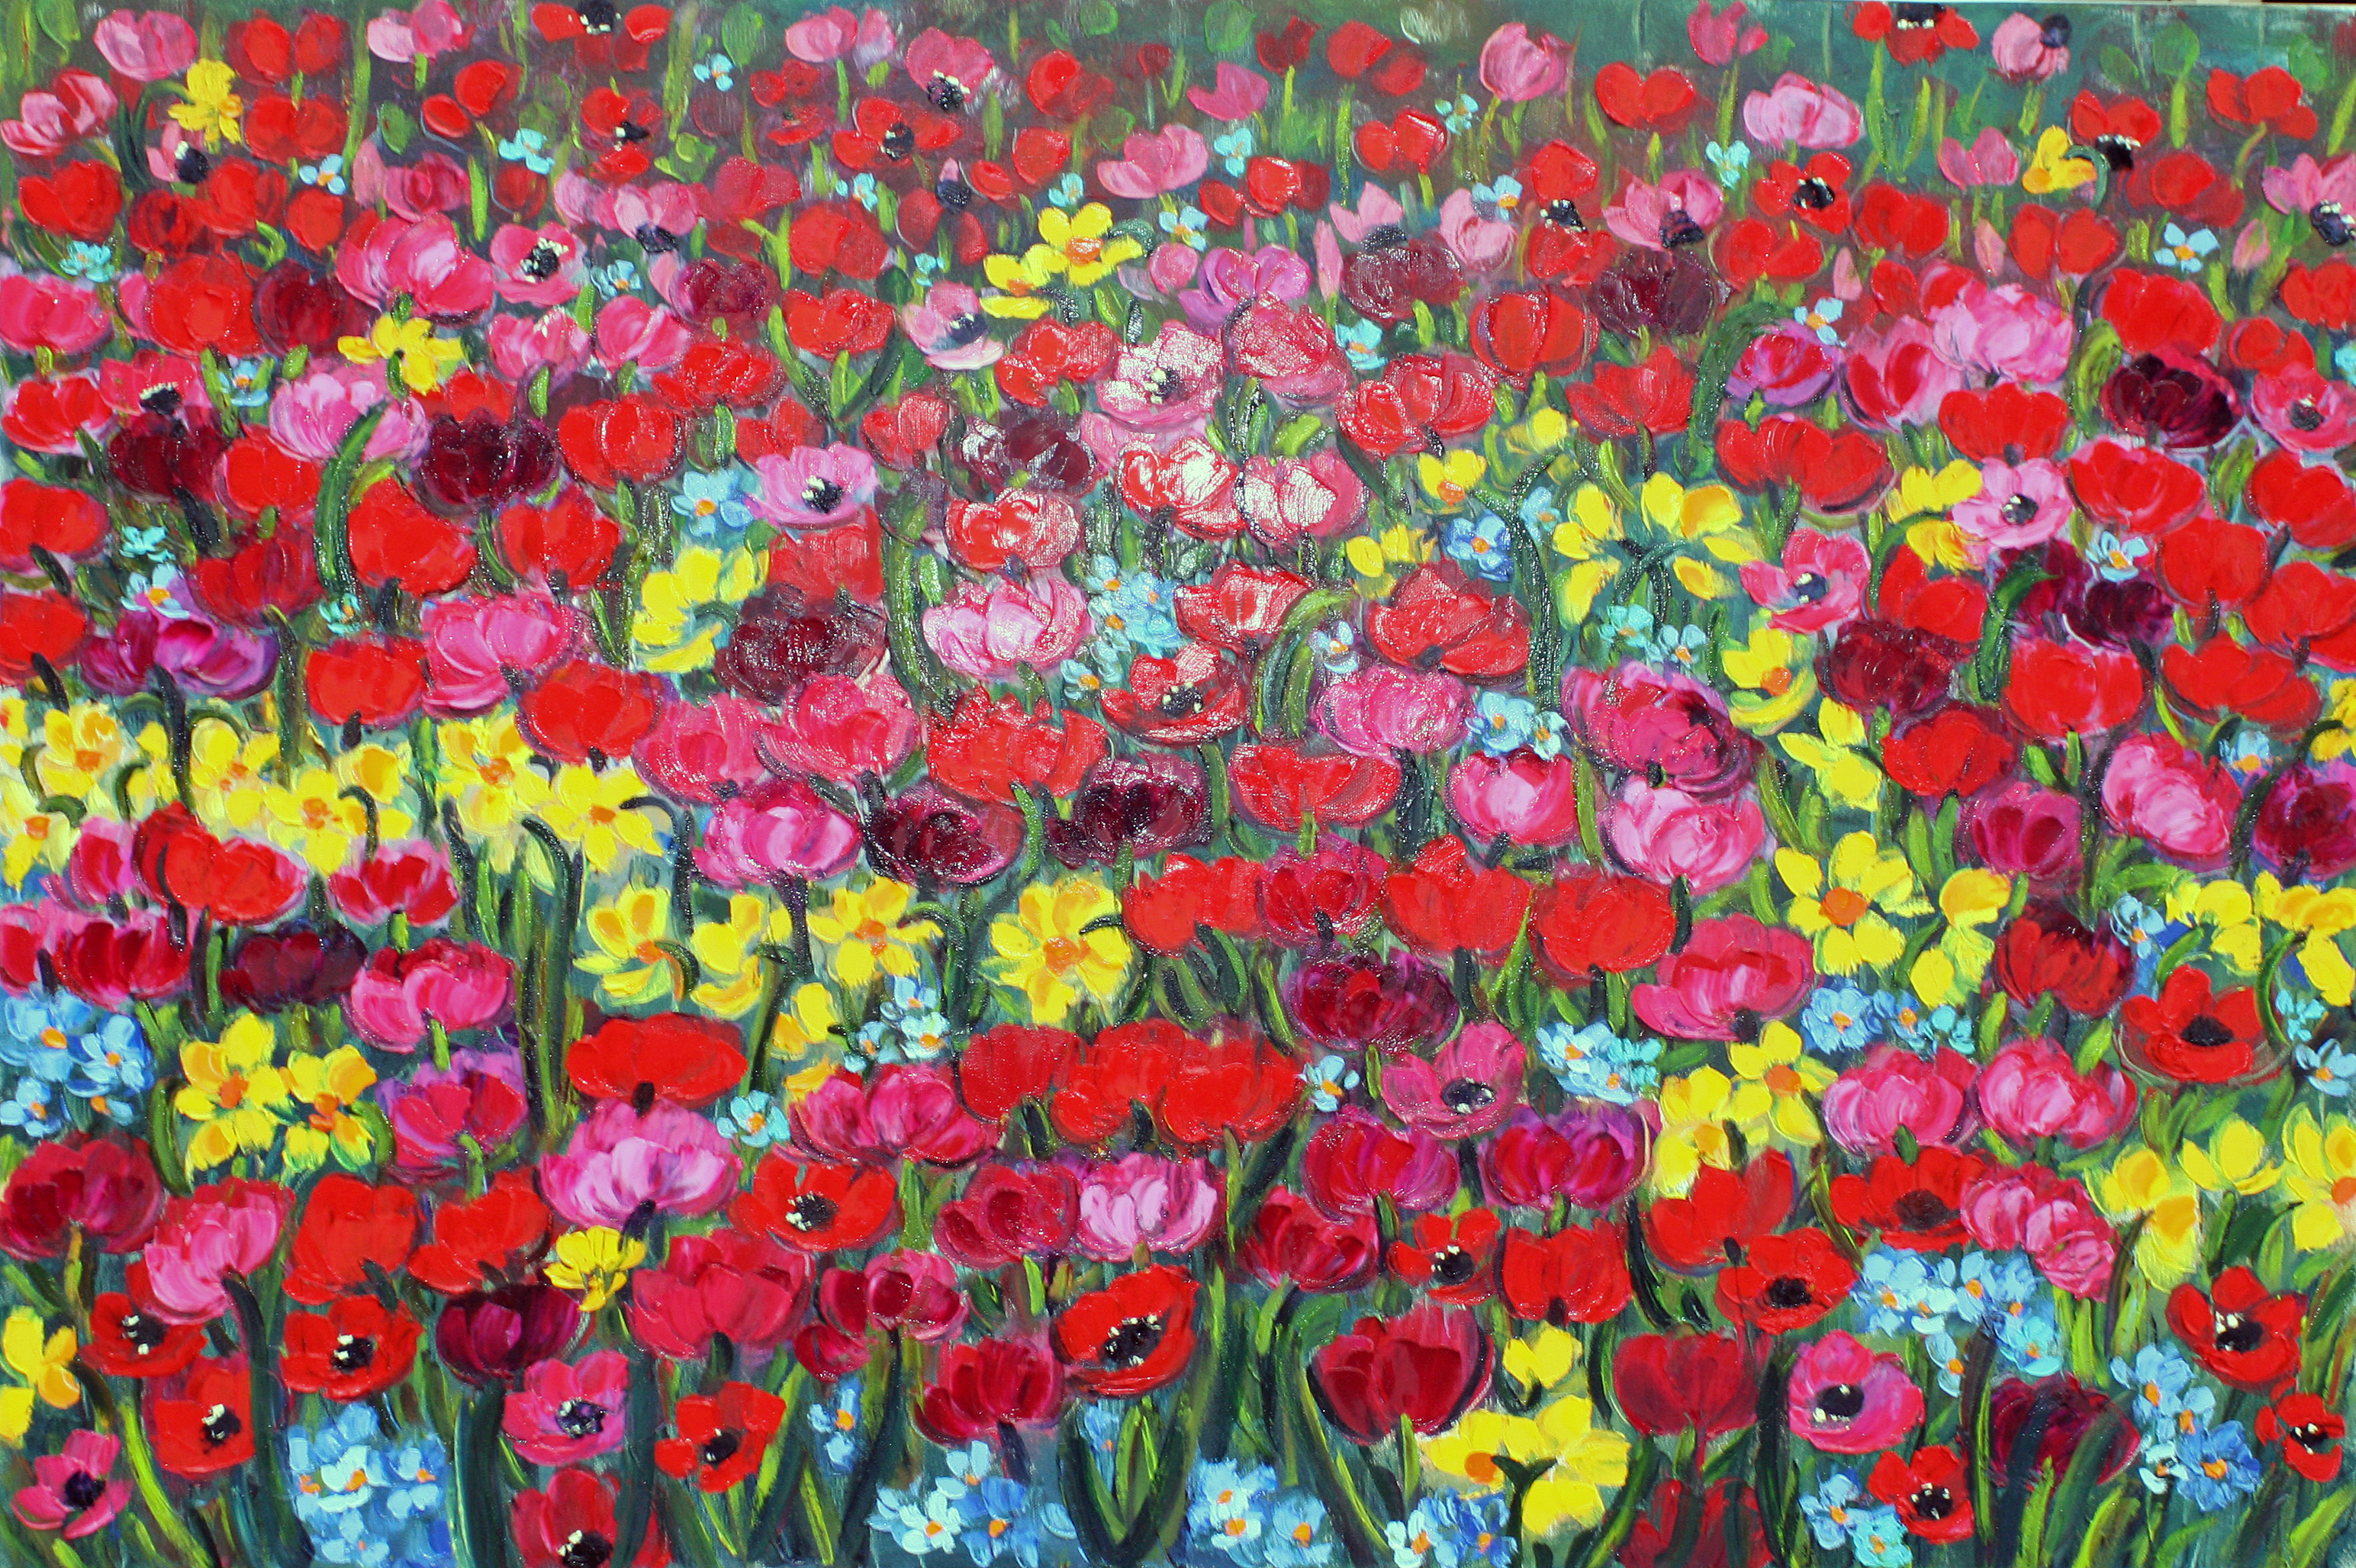 Rif. 4594 - Tulipani e giacinti